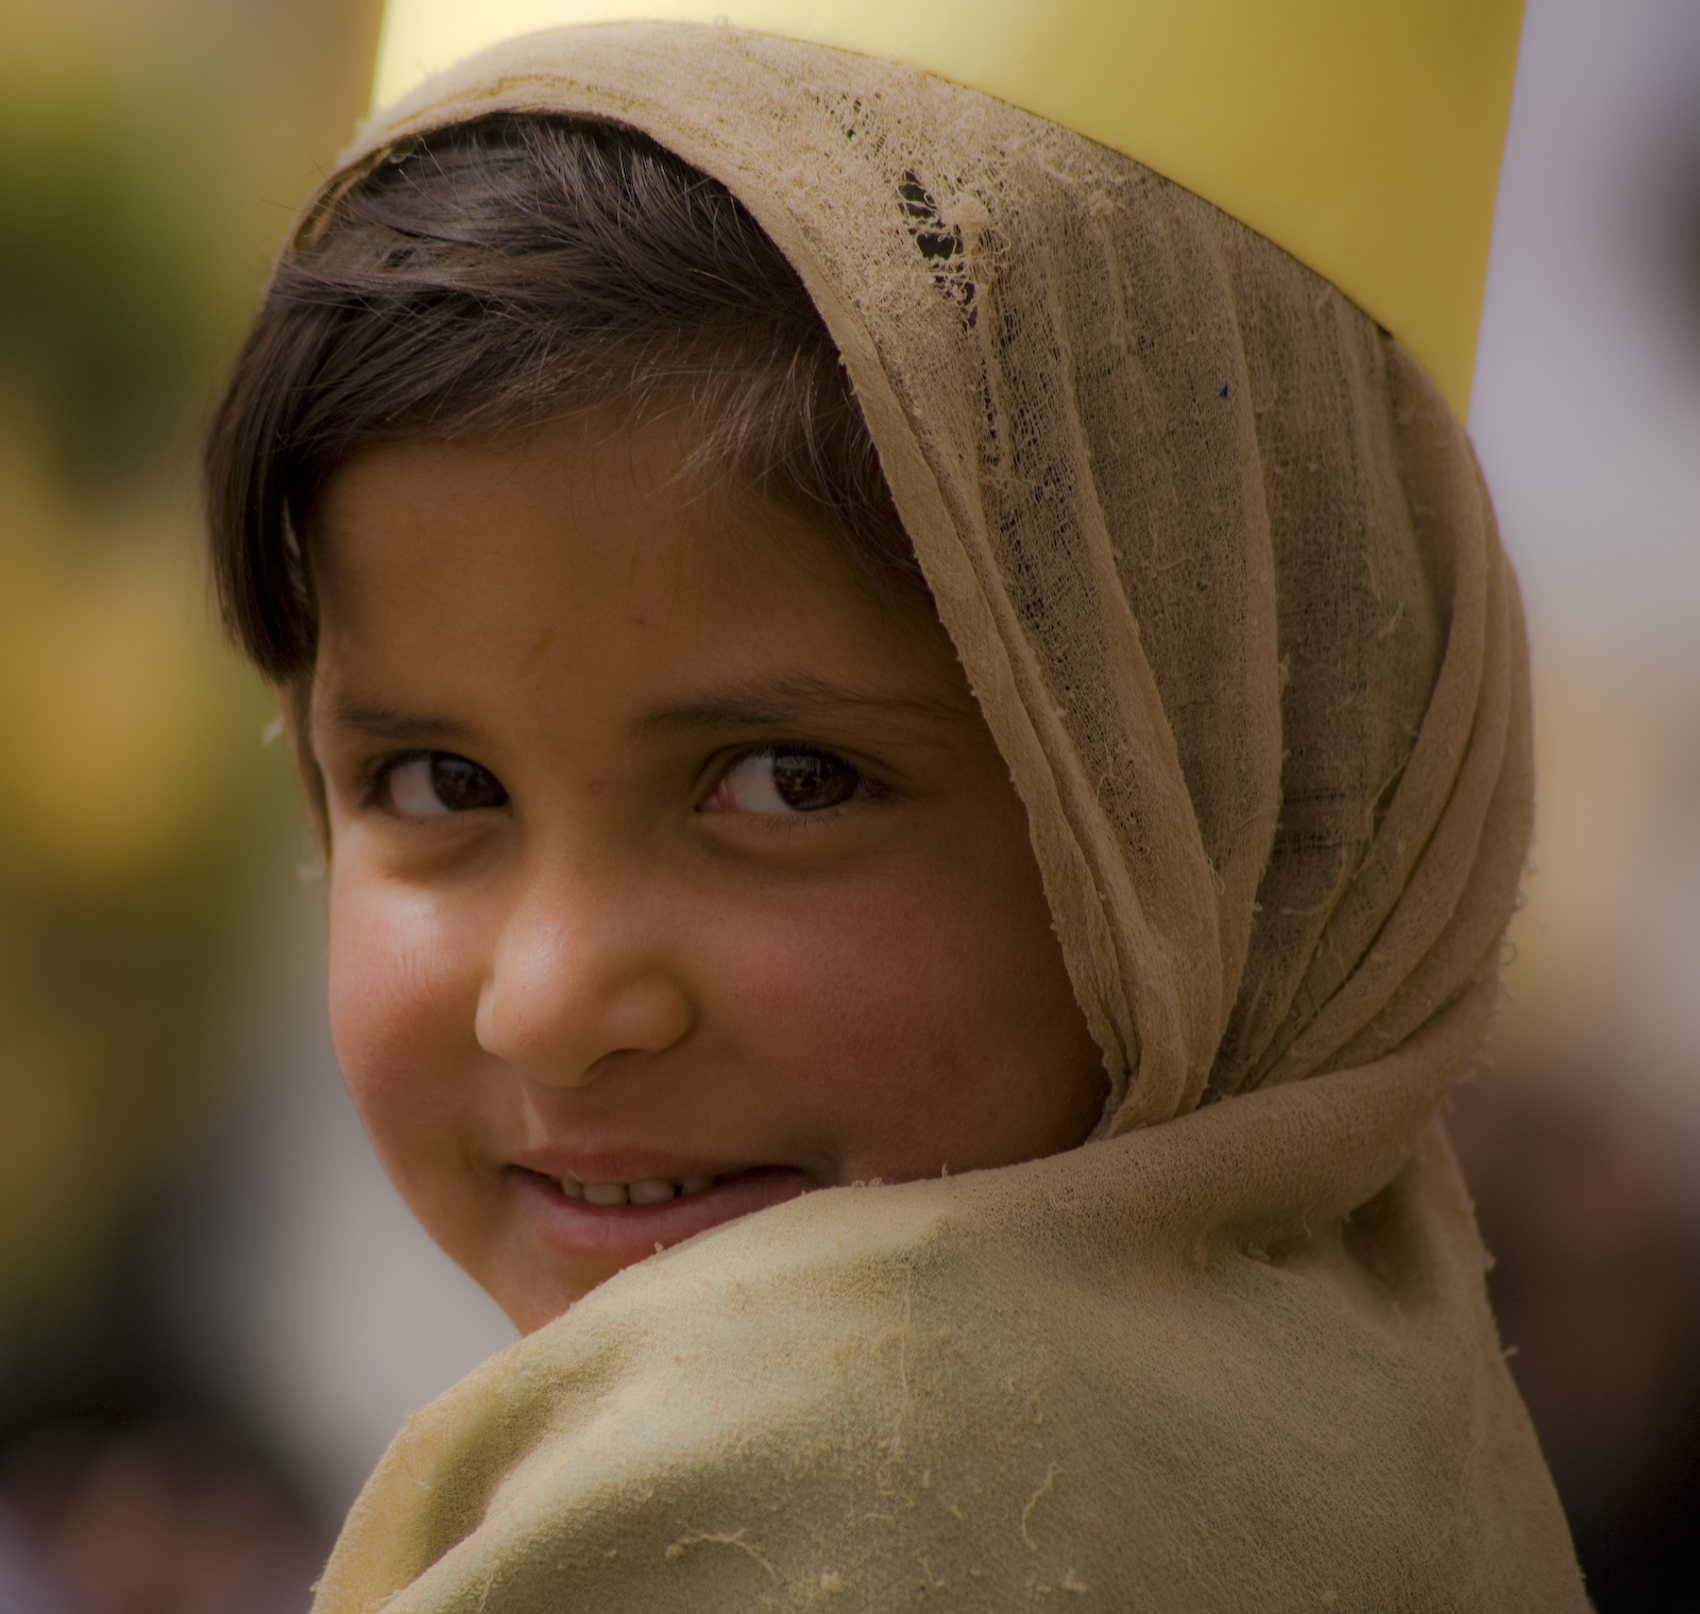 Schoolgirl, Kabul